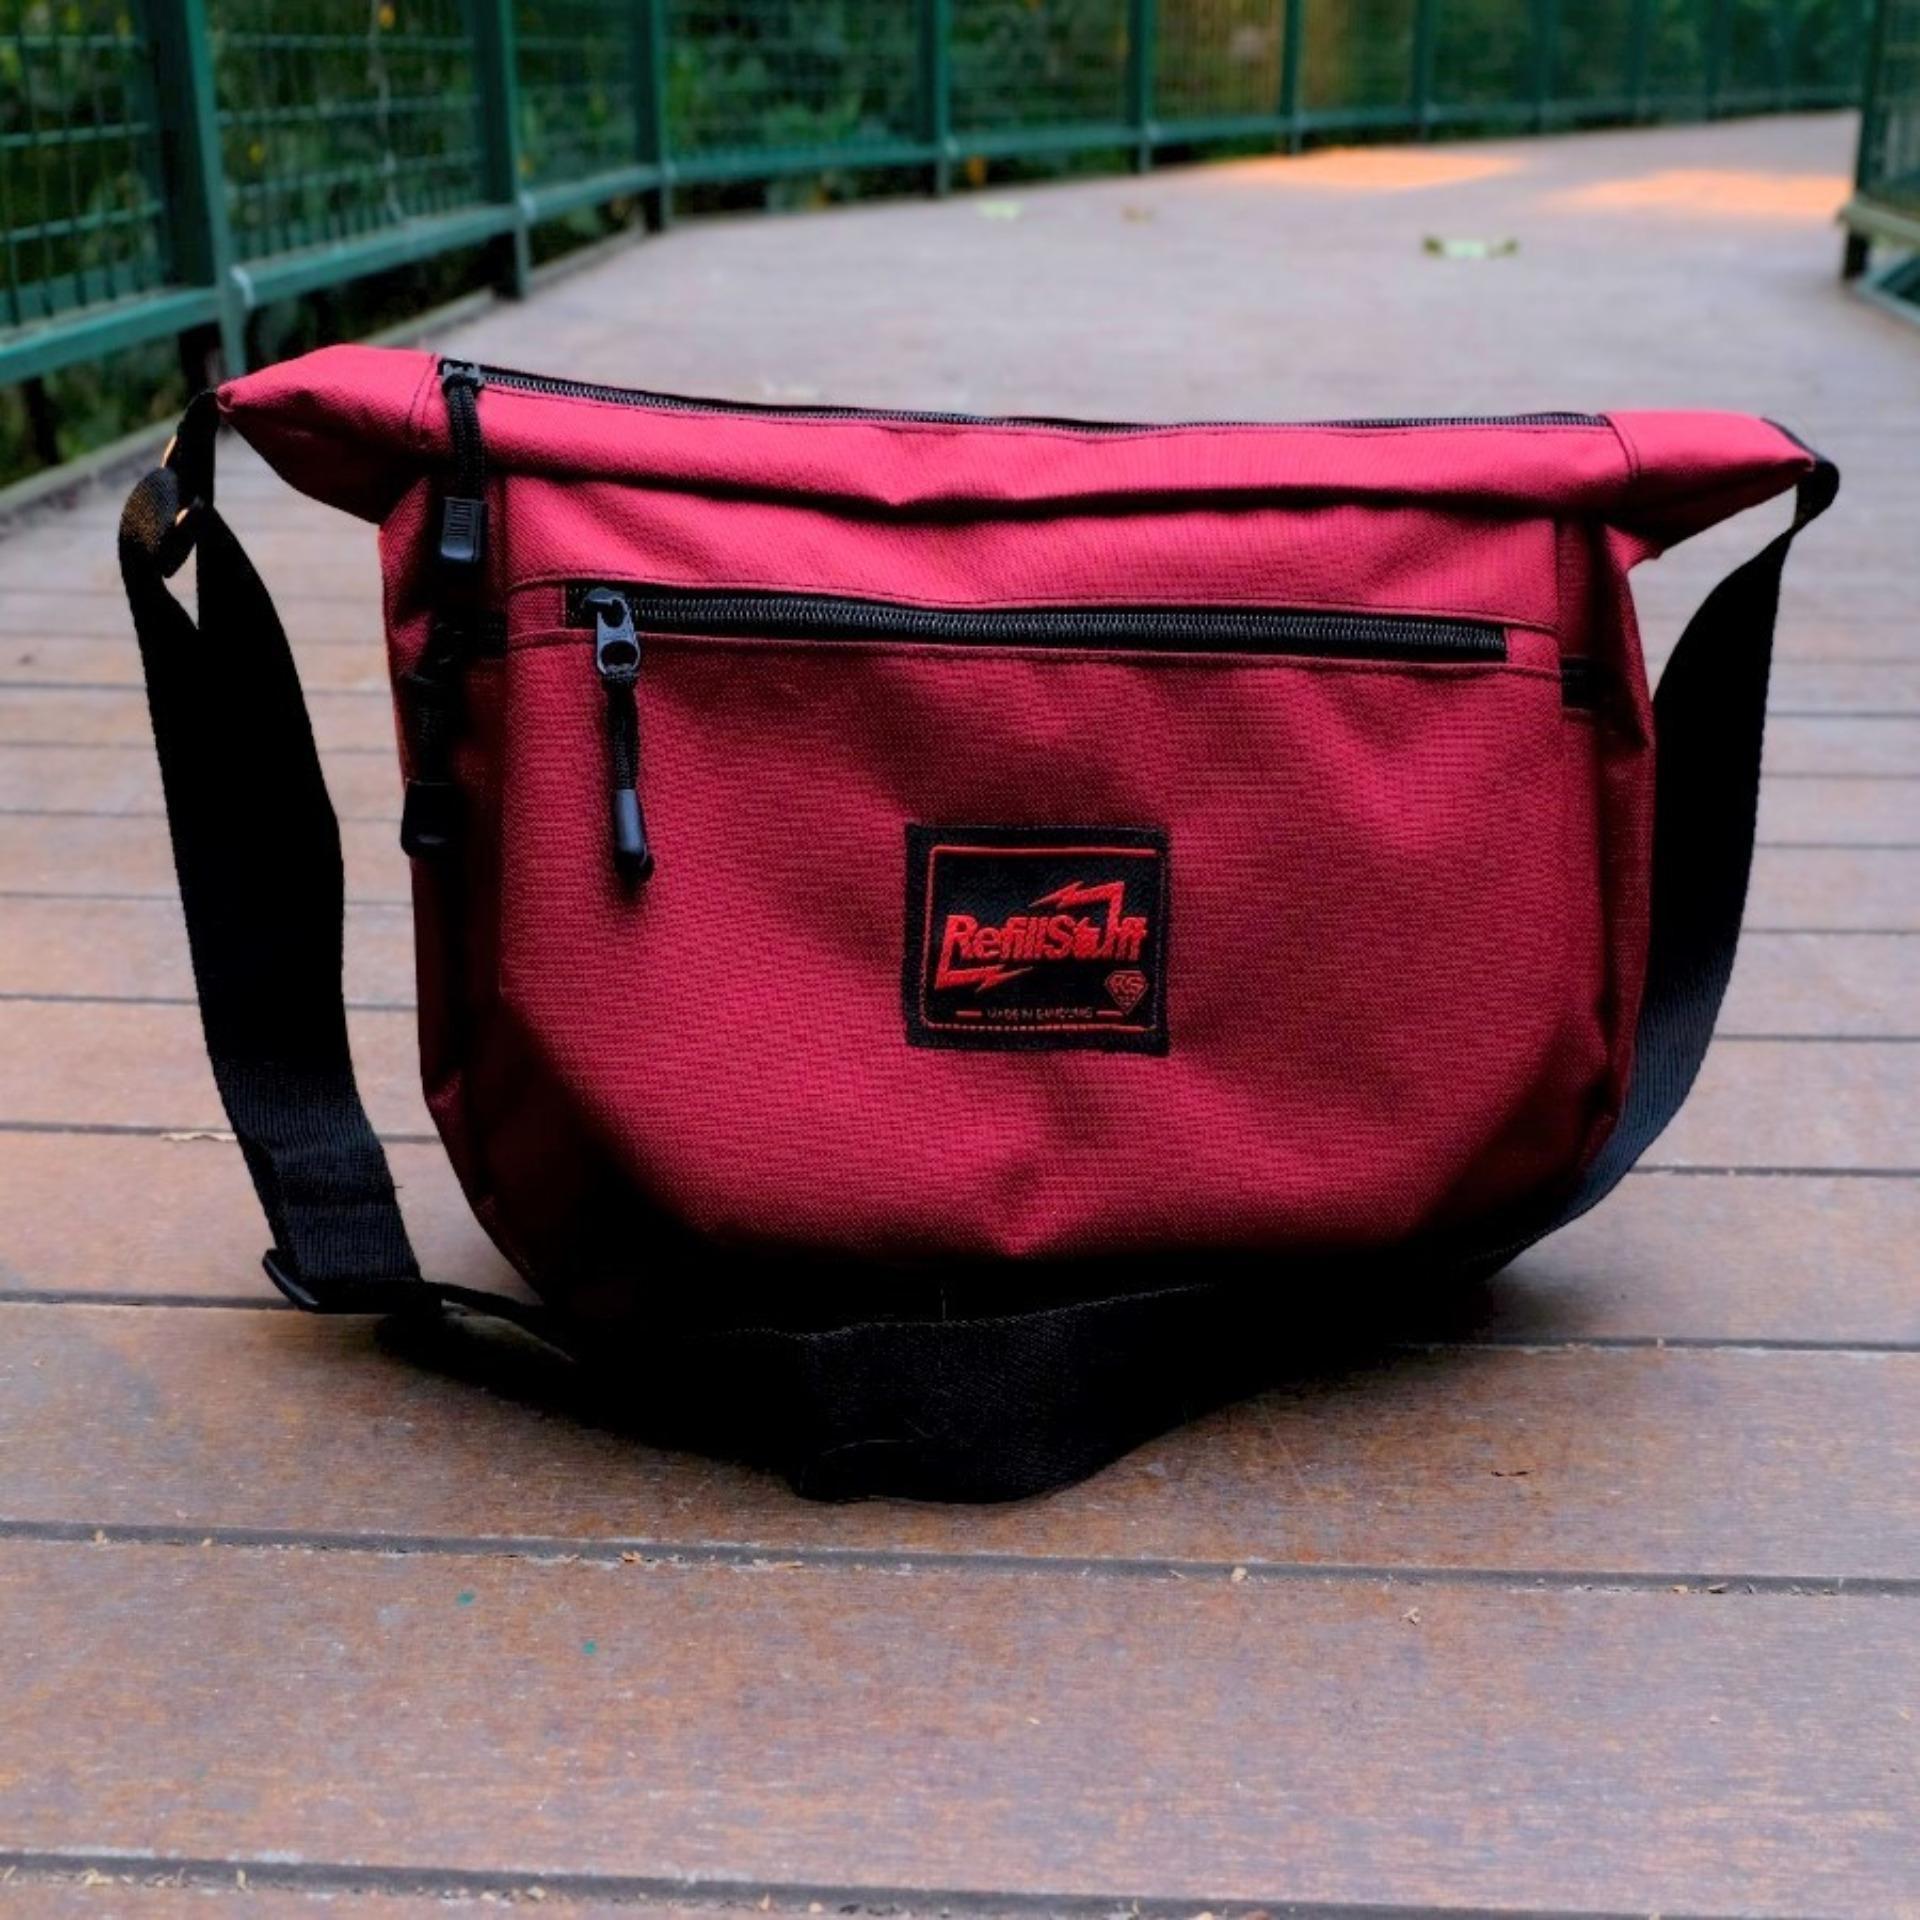 Harga Promo Metric Sling Bag Korea Tas Ransel Tali Satu Waistbag Waisbag Atau Selempang Best Seller Bahu Waistpack Unisex Rf